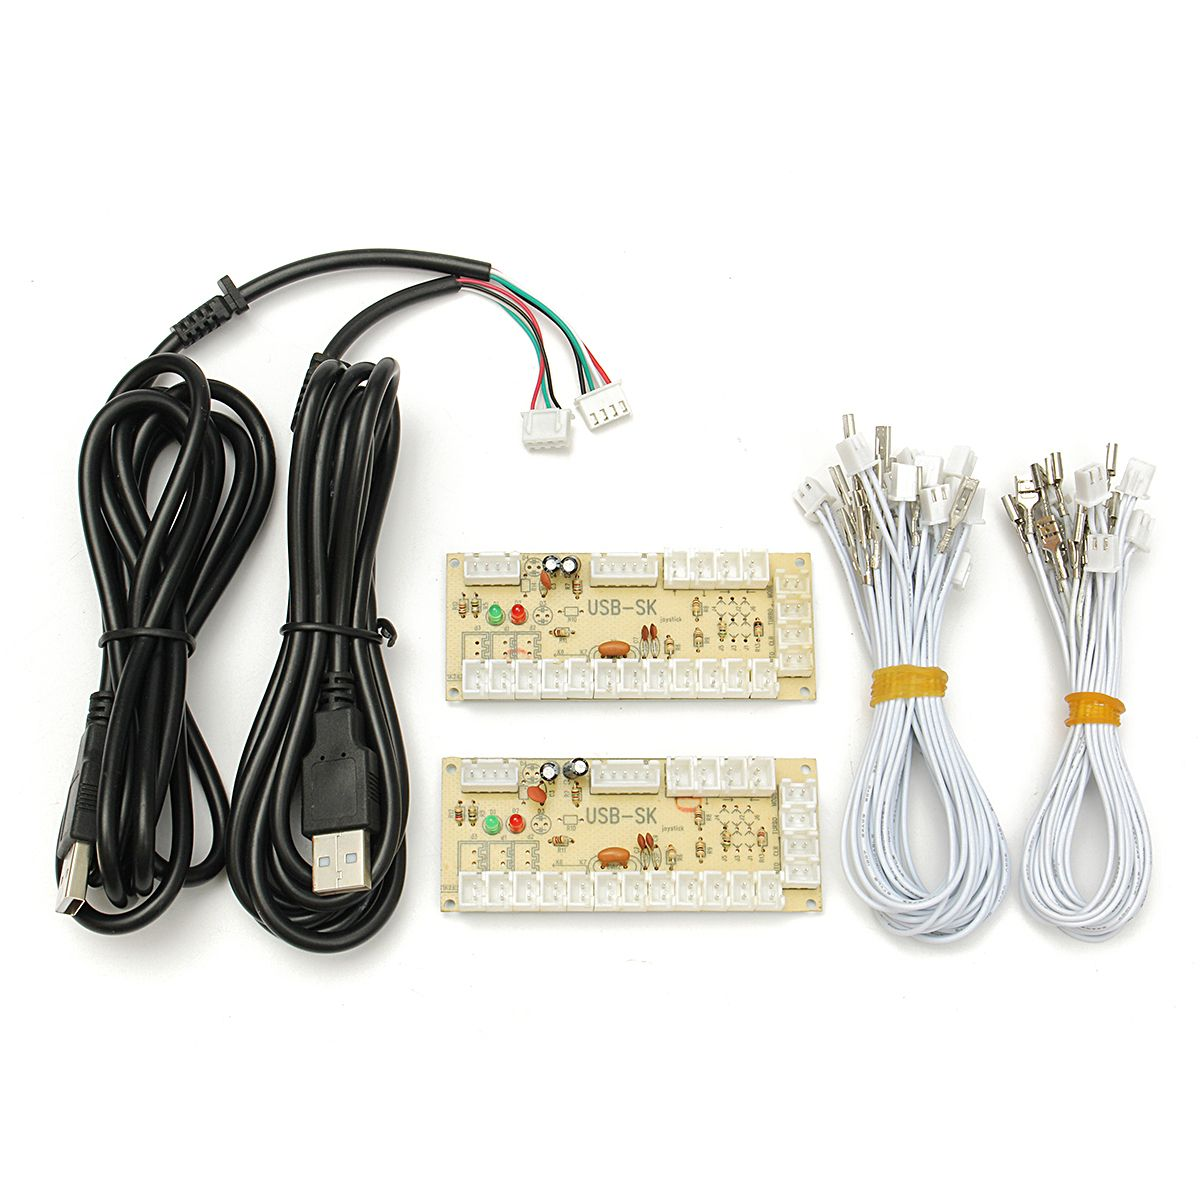 Arcade Encoder Pc To 2pin Joystick Happ Button 48mm Wires Zero Electrical Wiring Games Delay Usb